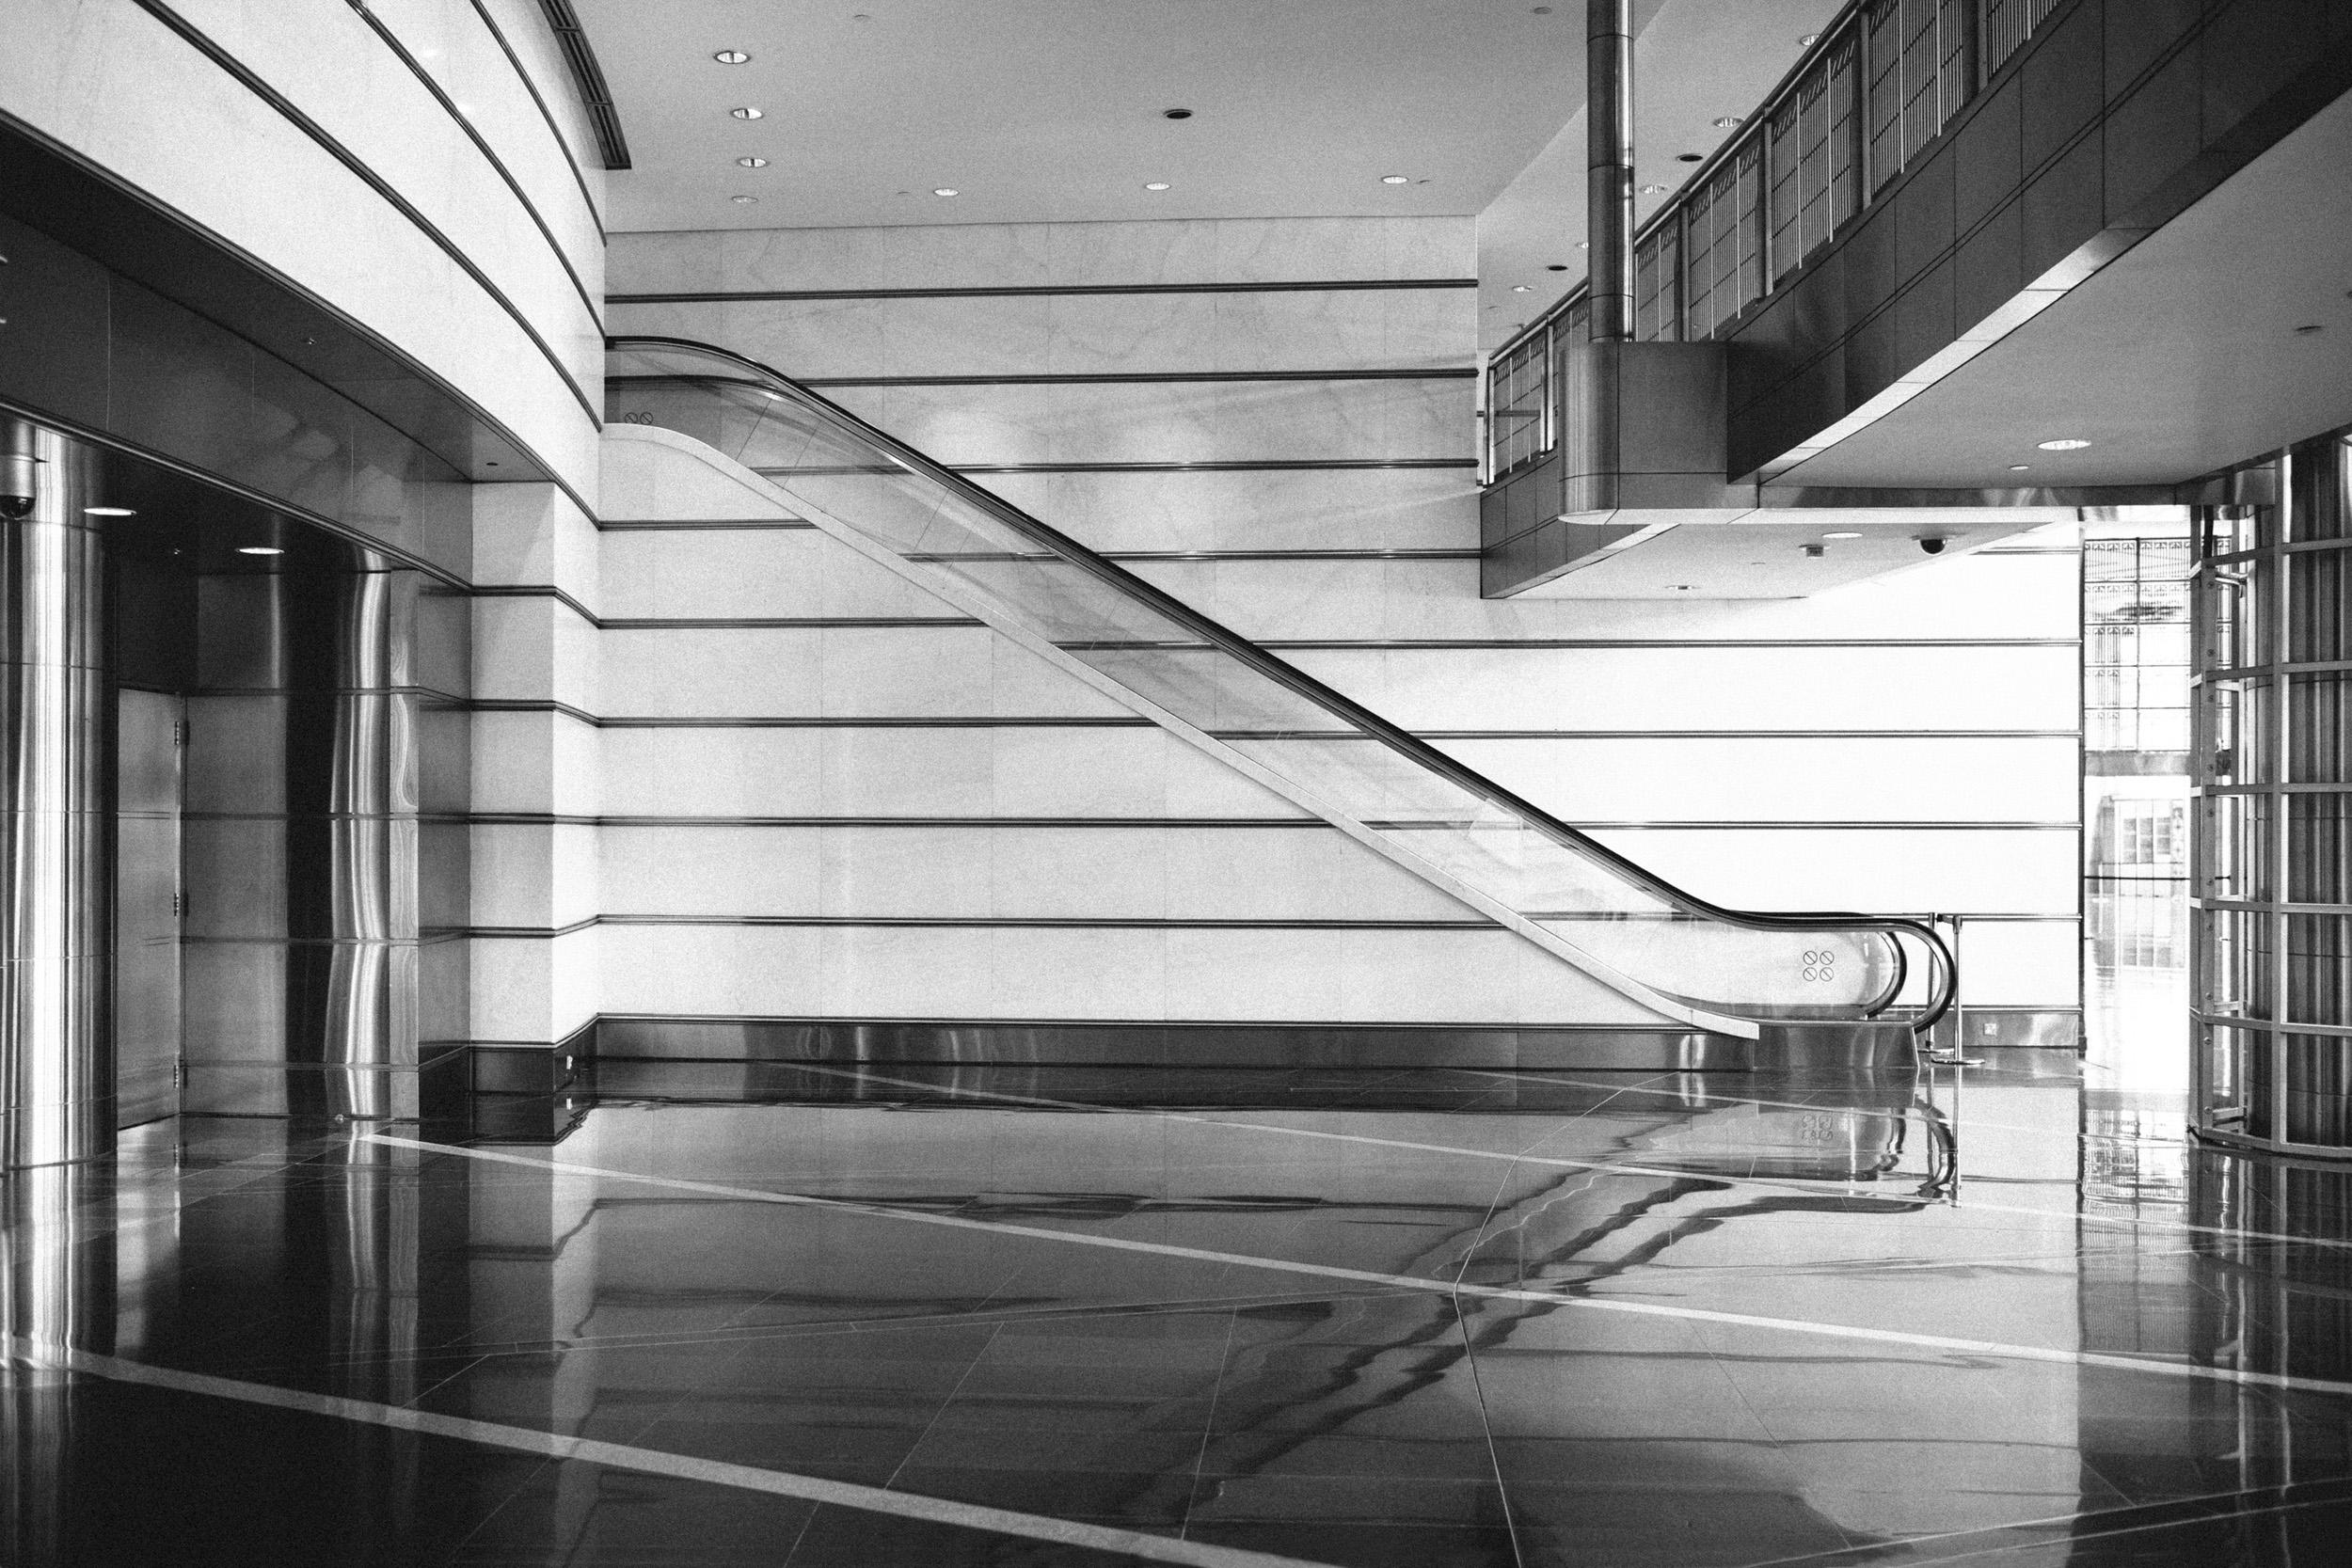 kuala_lumpur_architecture_photographer_04.jpg